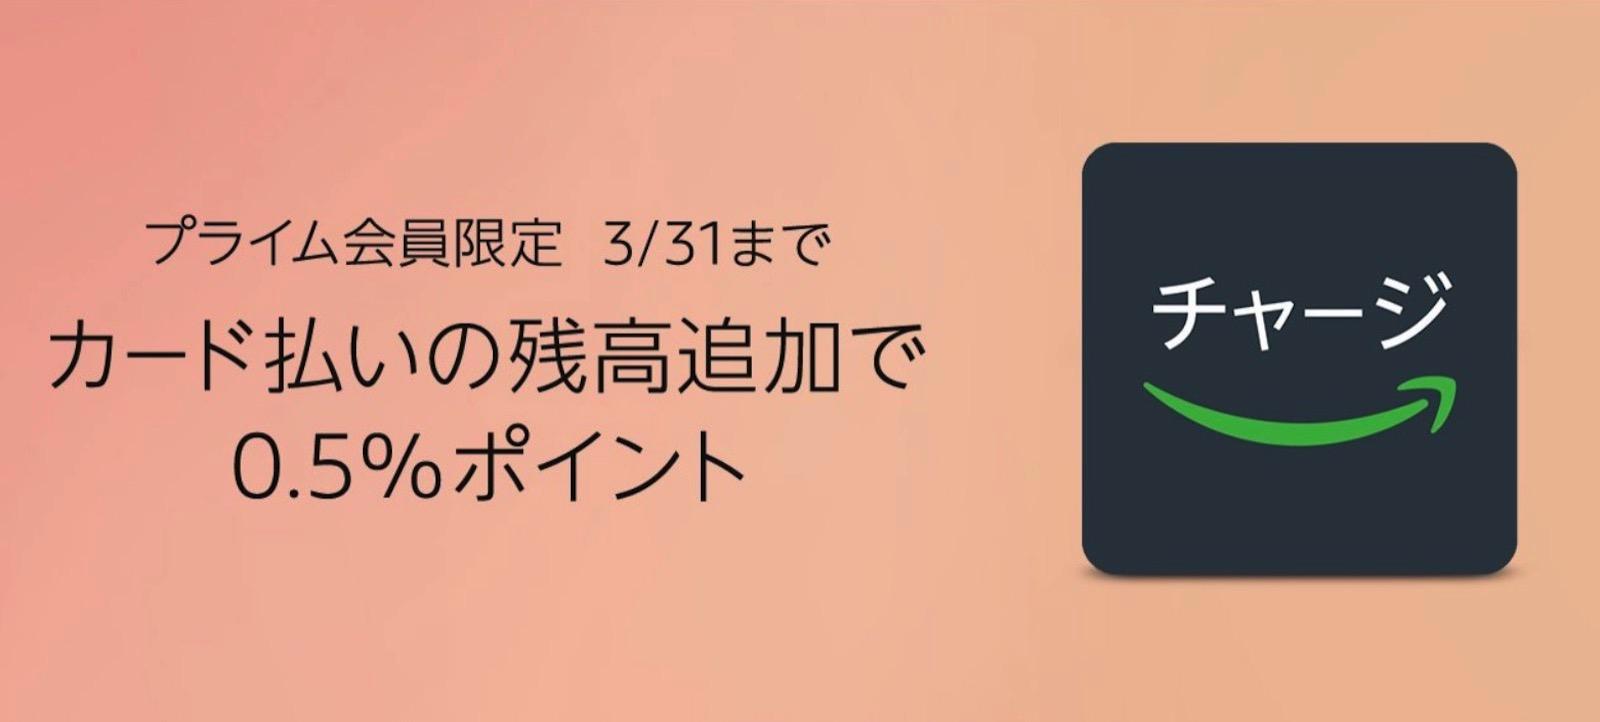 Amazon-Credit-Point-Campaign.jpg